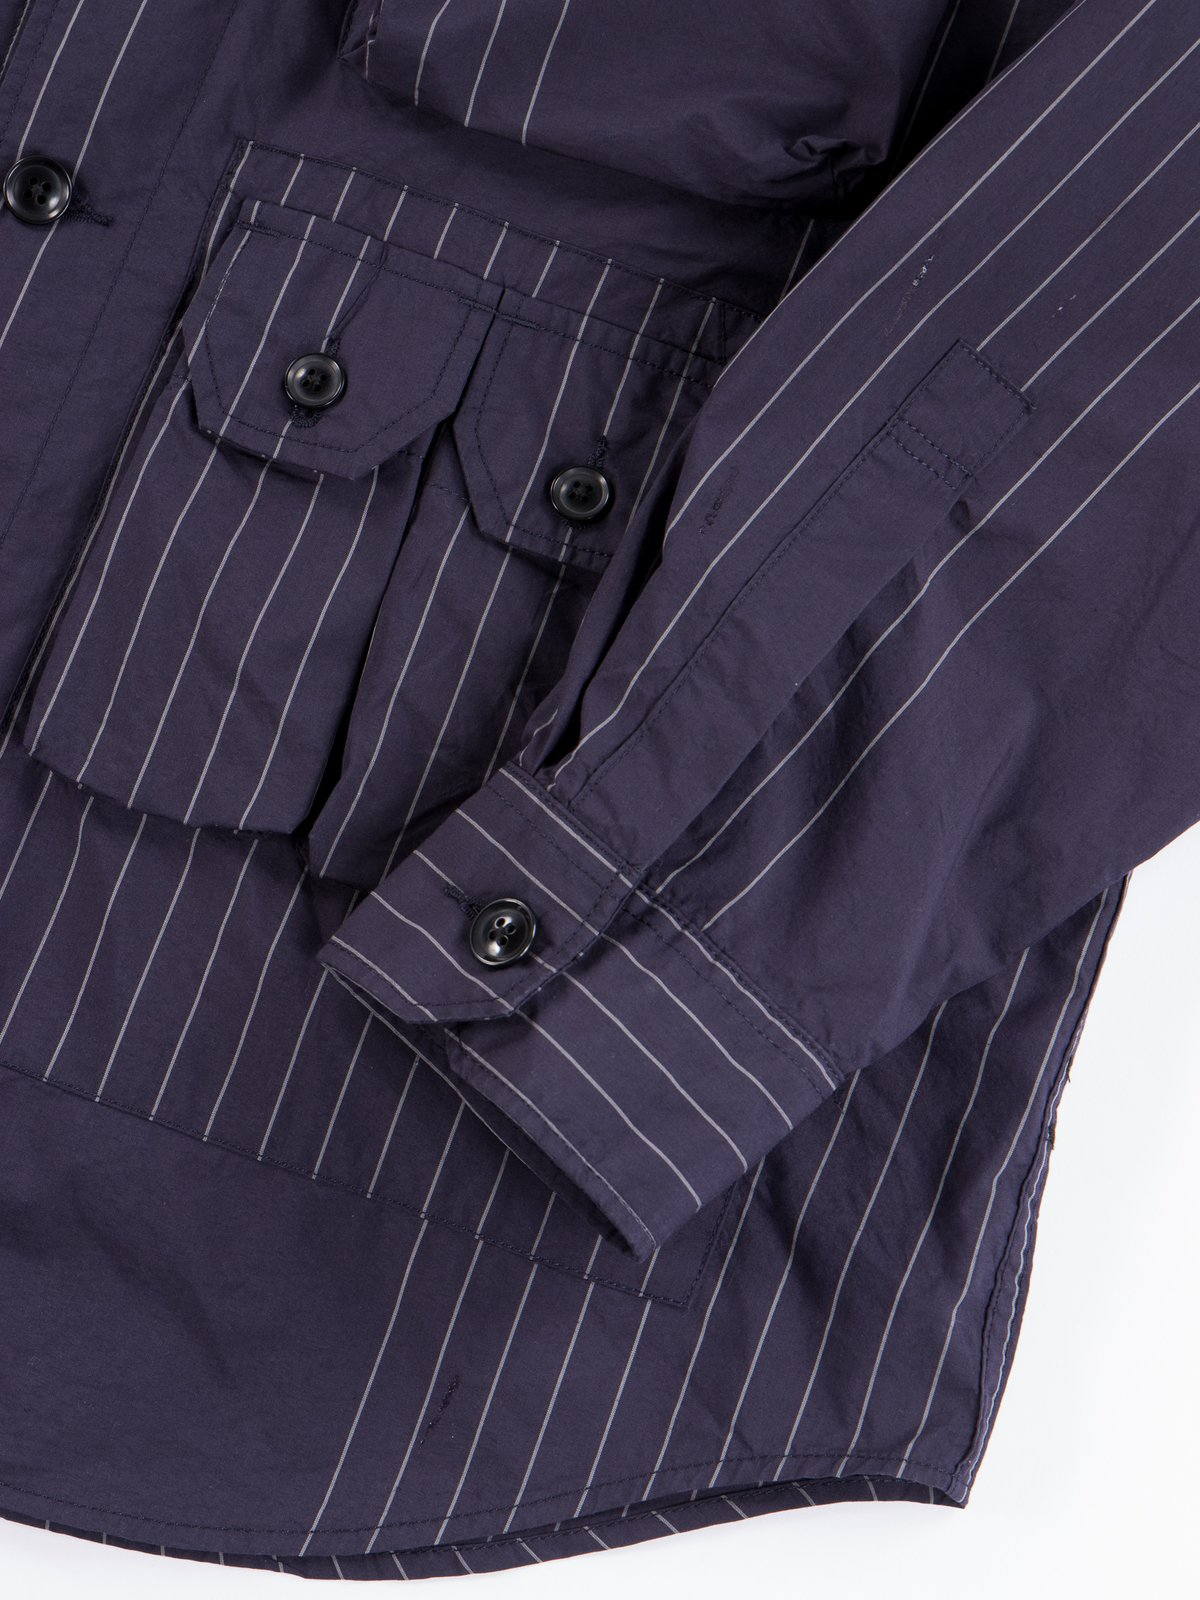 Dark Navy Nyco Gangster Stripe Explorer Shirt Jacket - Image 6